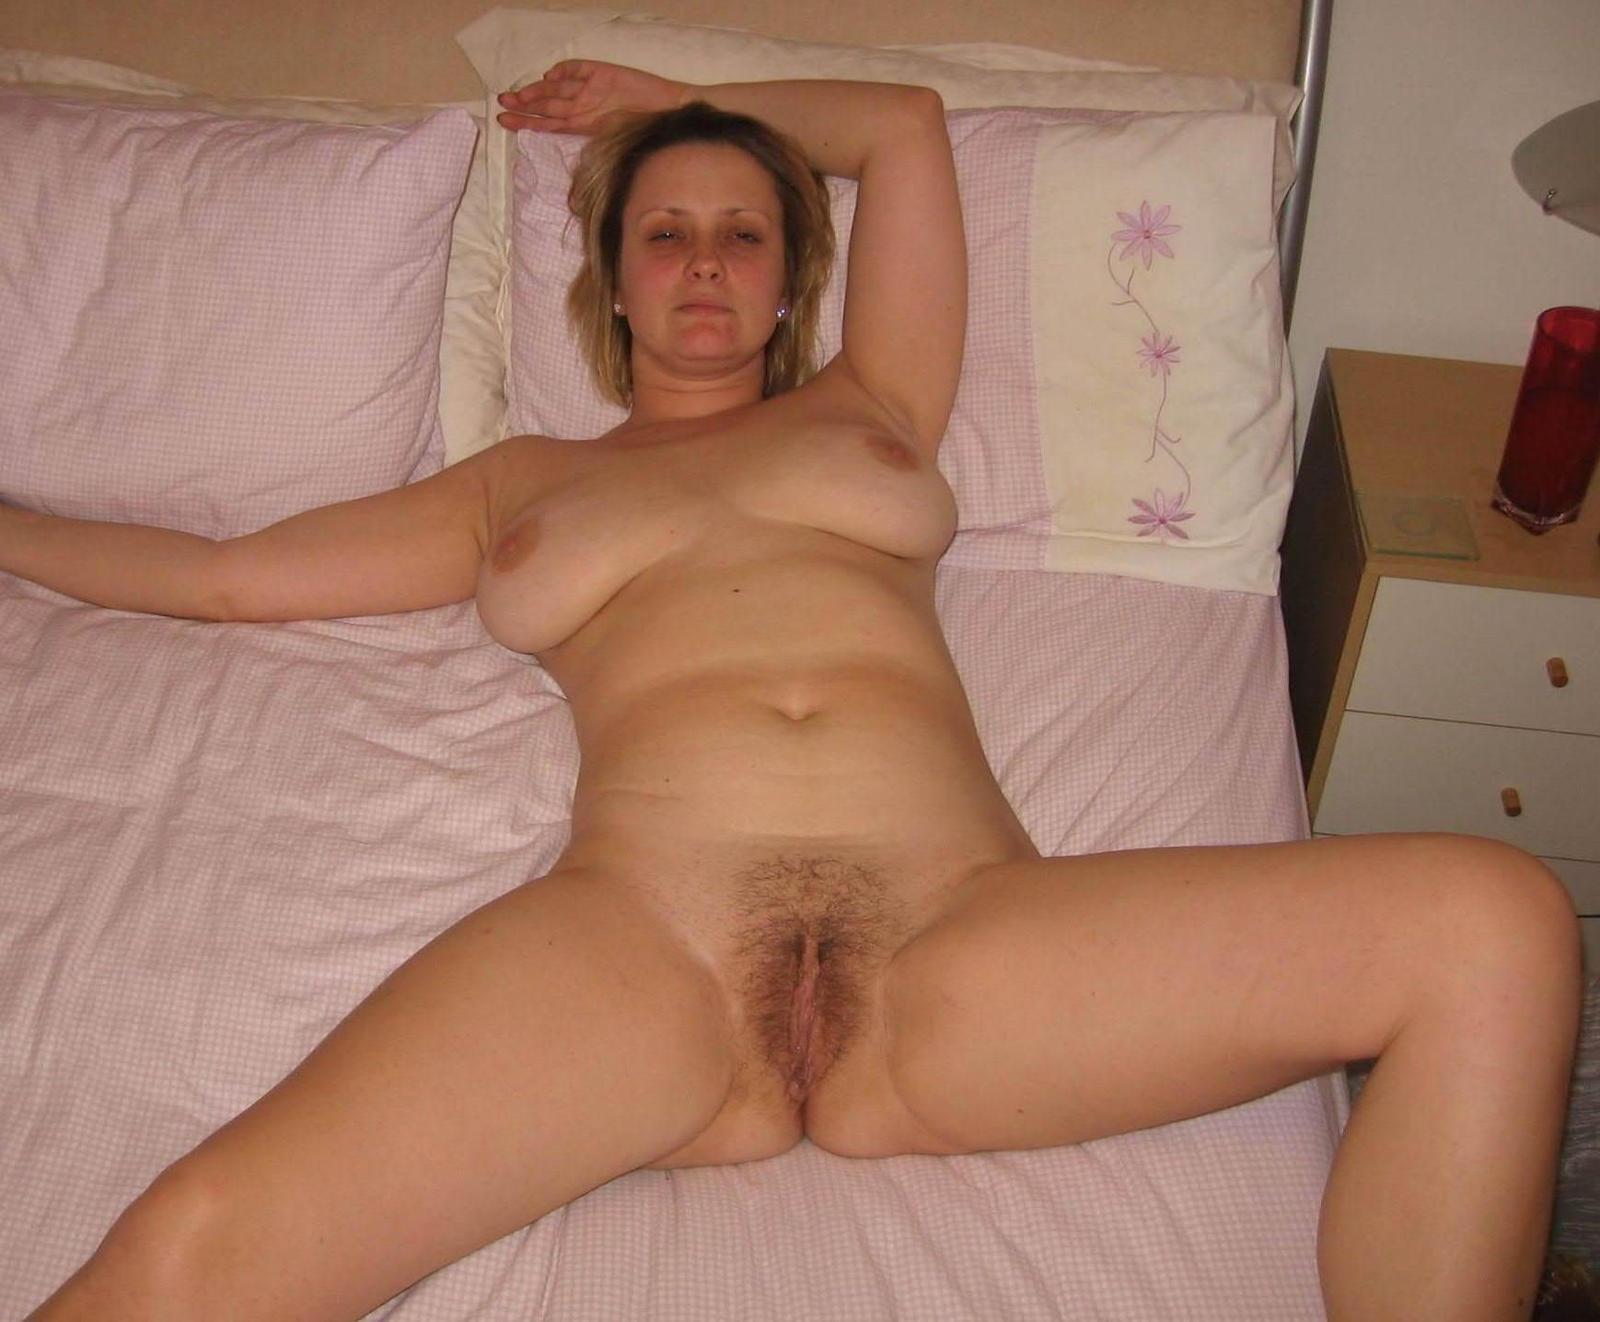 hairy-home-photo-wife